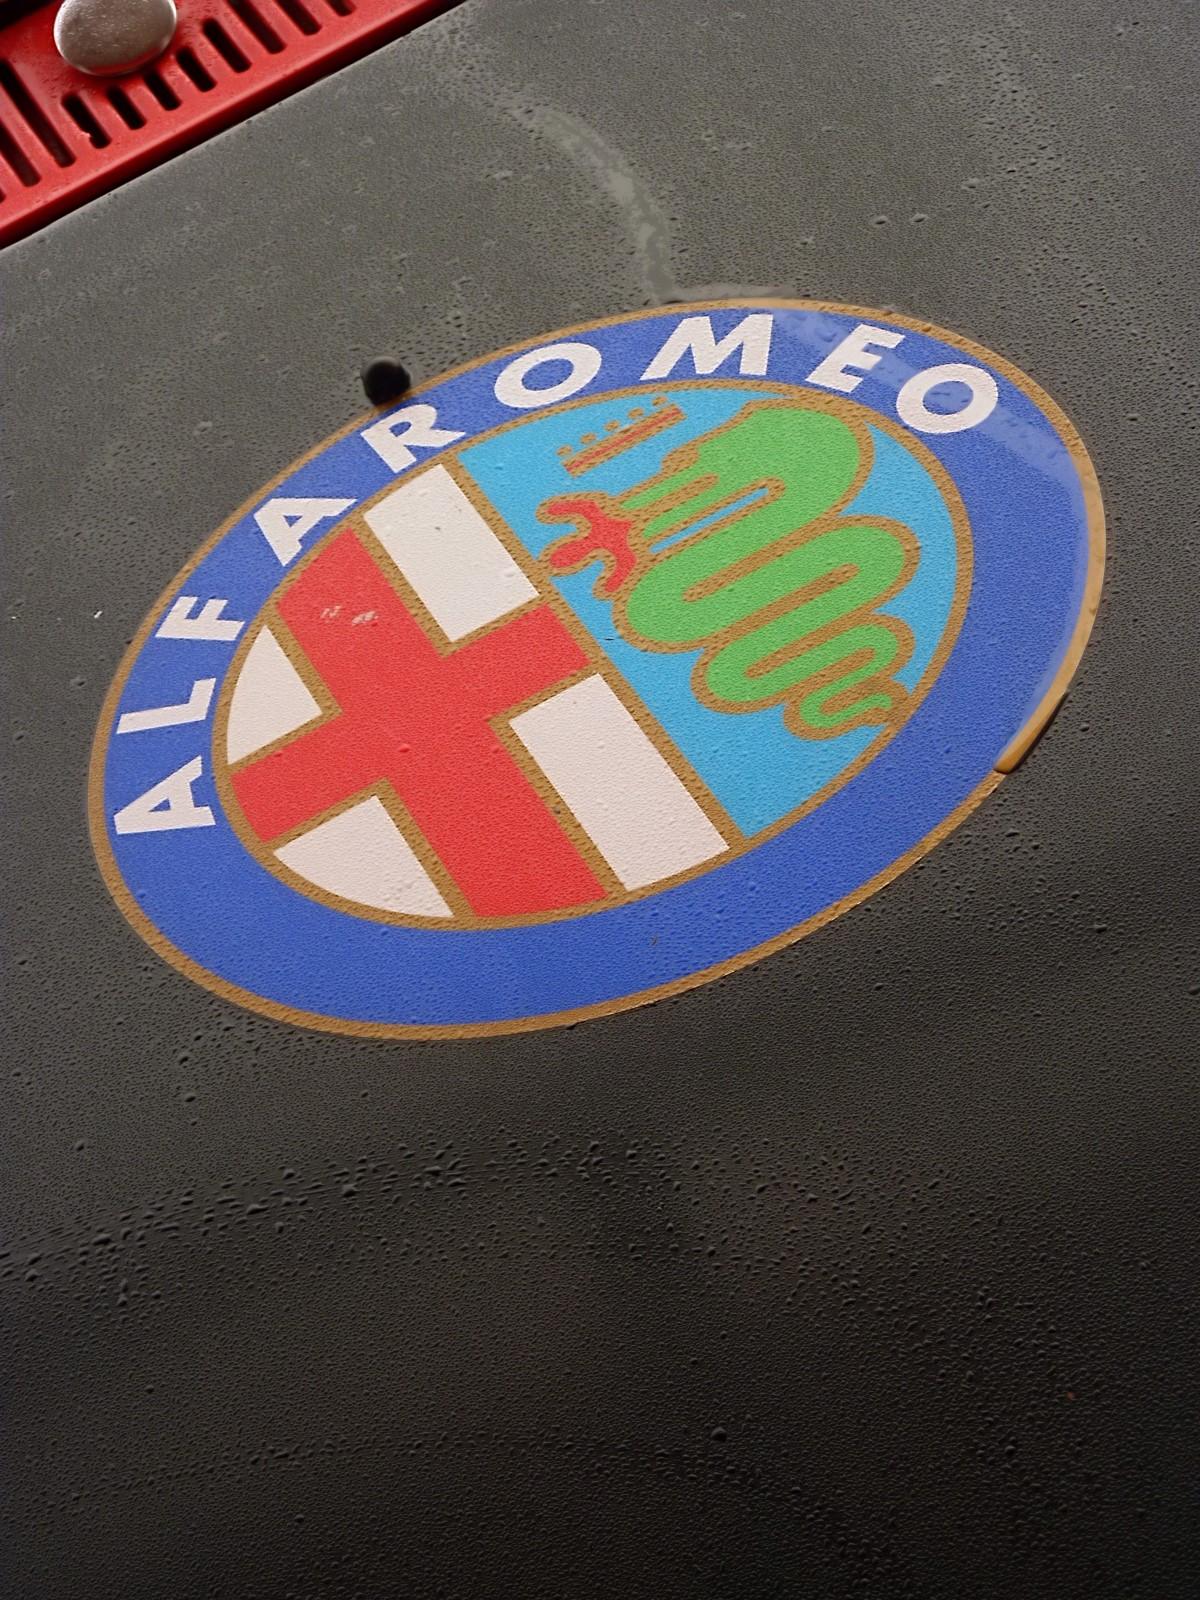 1974 Alfa Romeo Alfetta GT 1800 Group 2 (28)